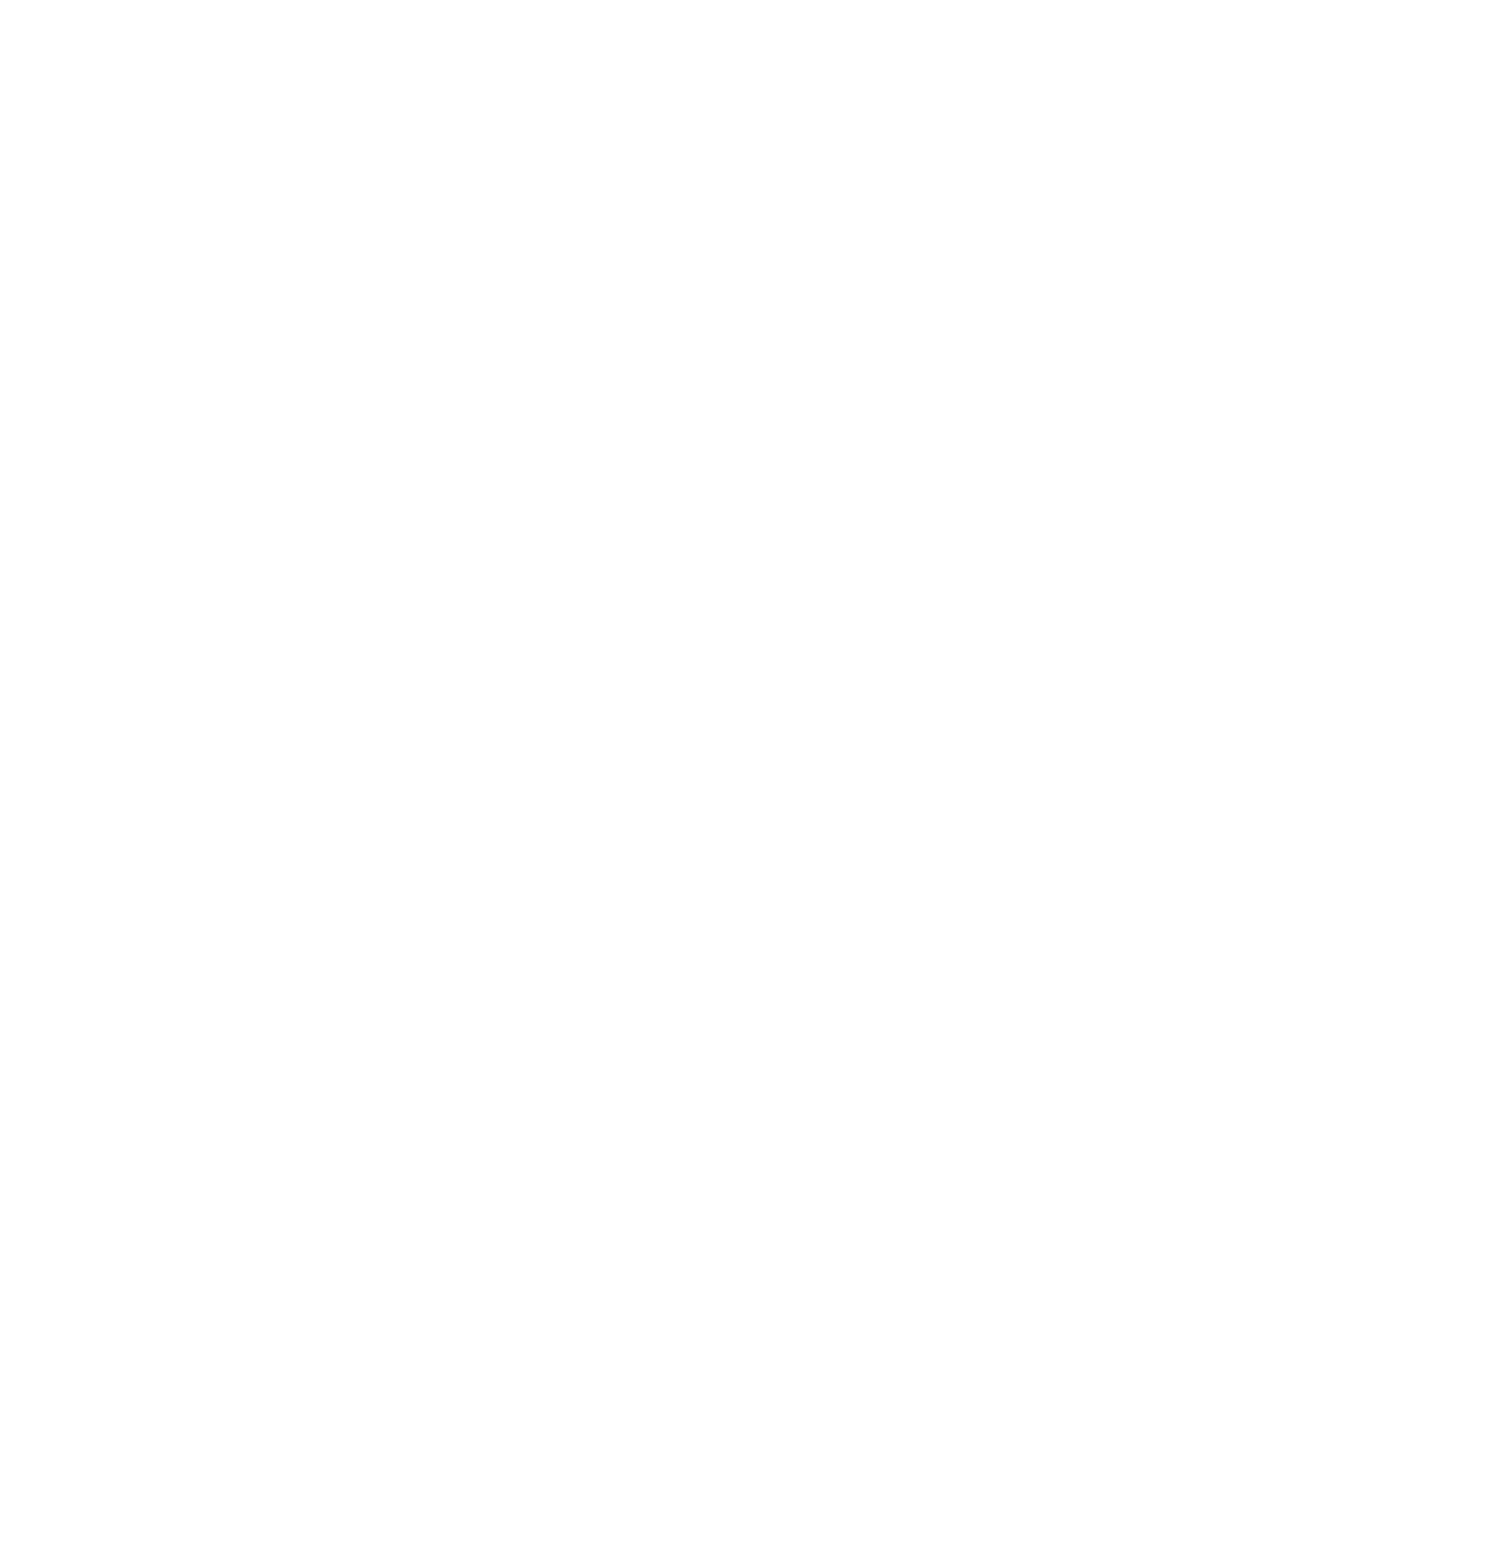 Association Sport Travail Biologie